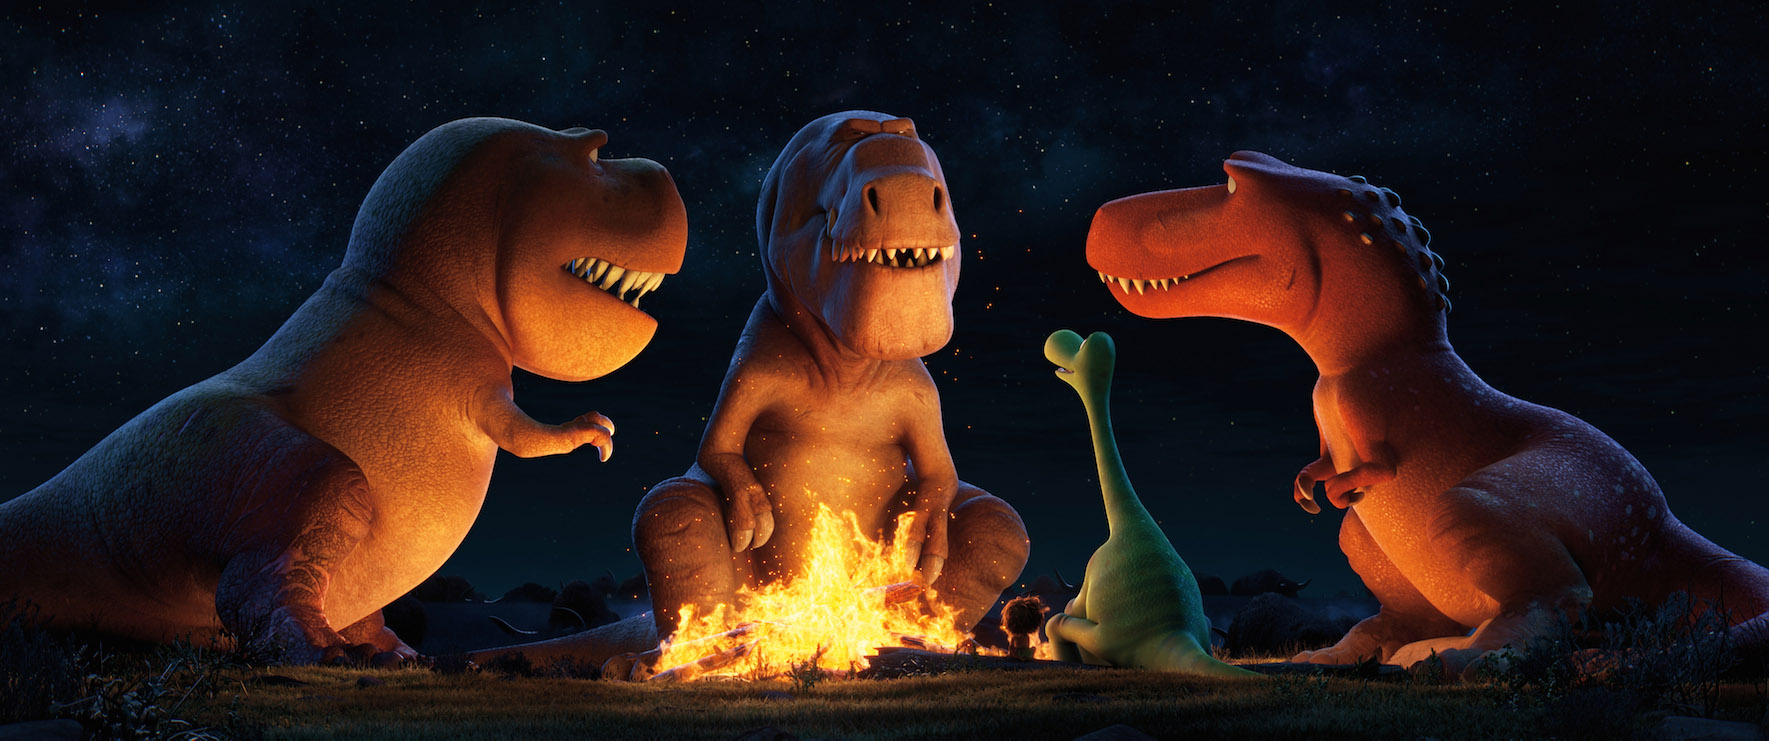 Photo via Disney Pixar